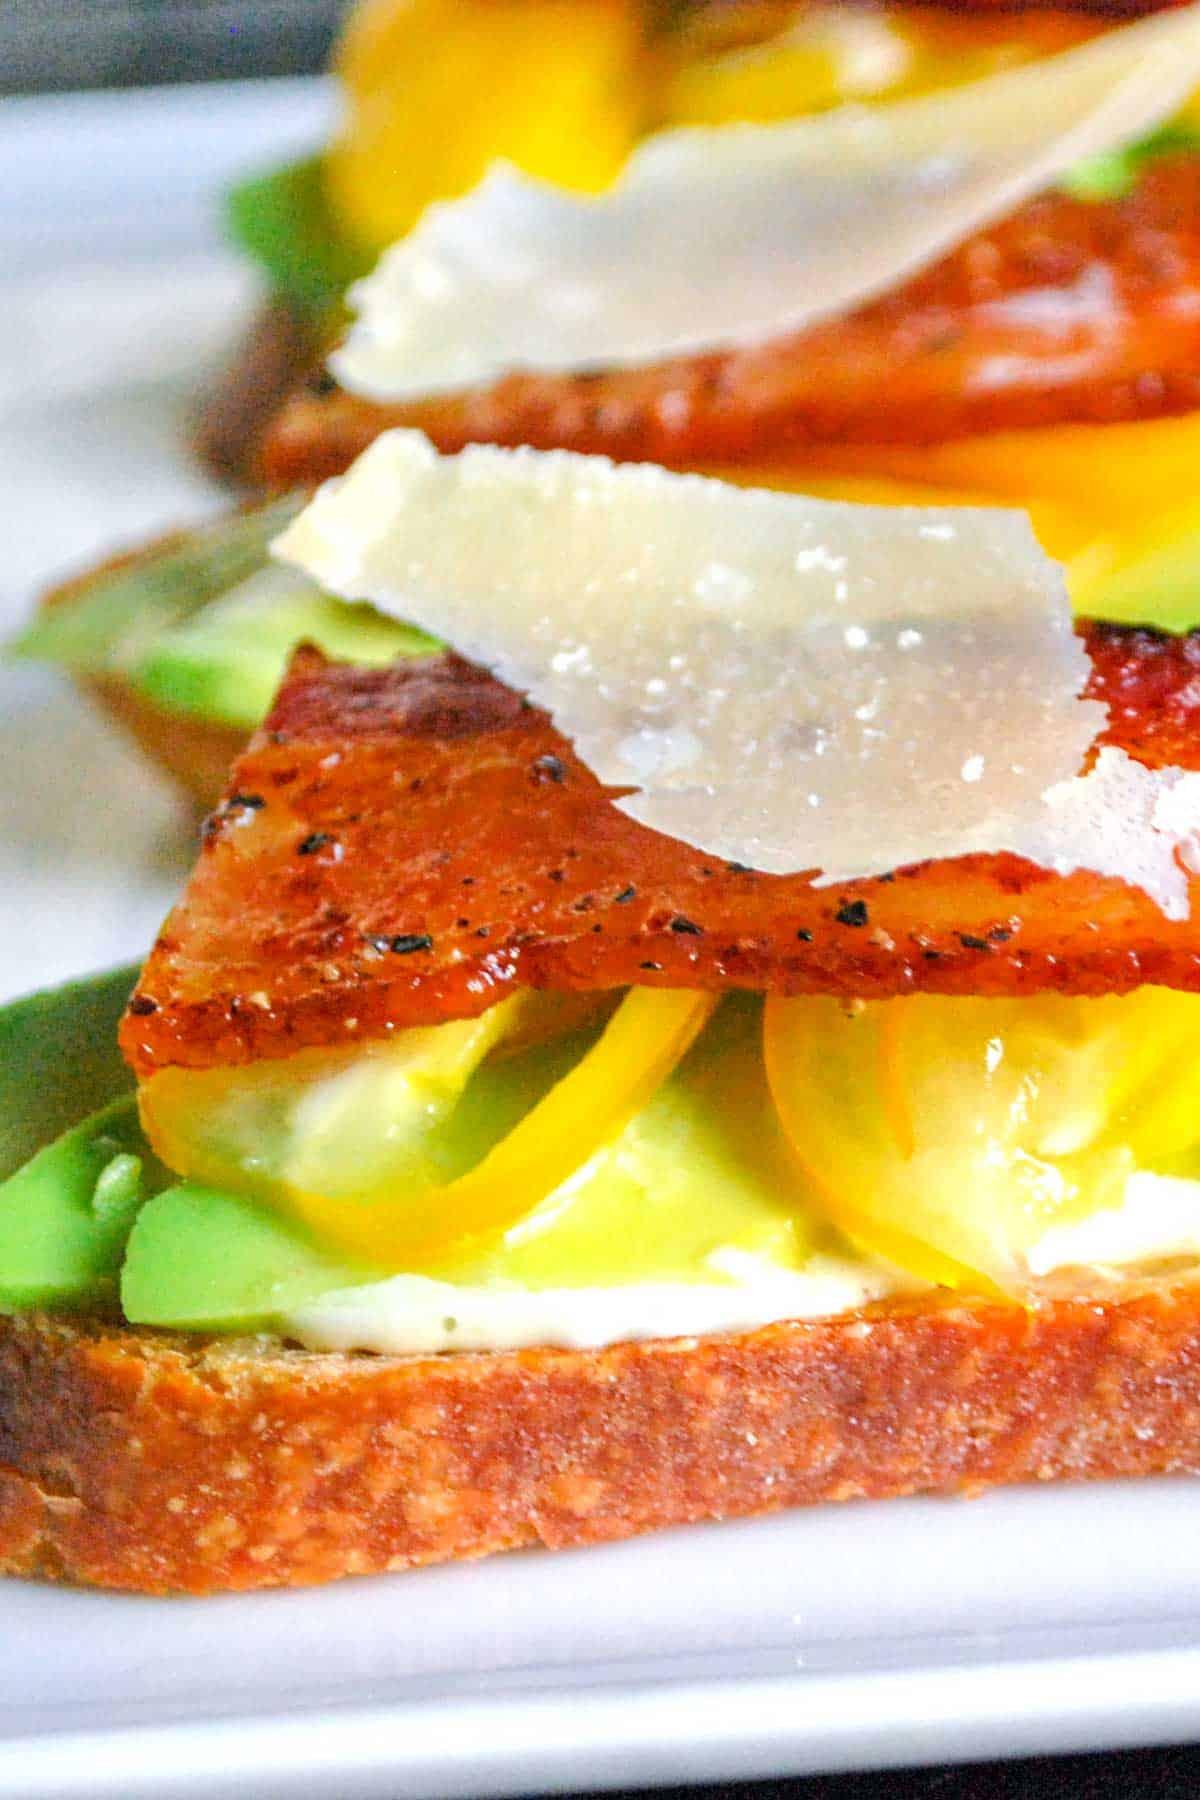 Open-Faced Sandwiches with Bacon, Tomato and Avocado